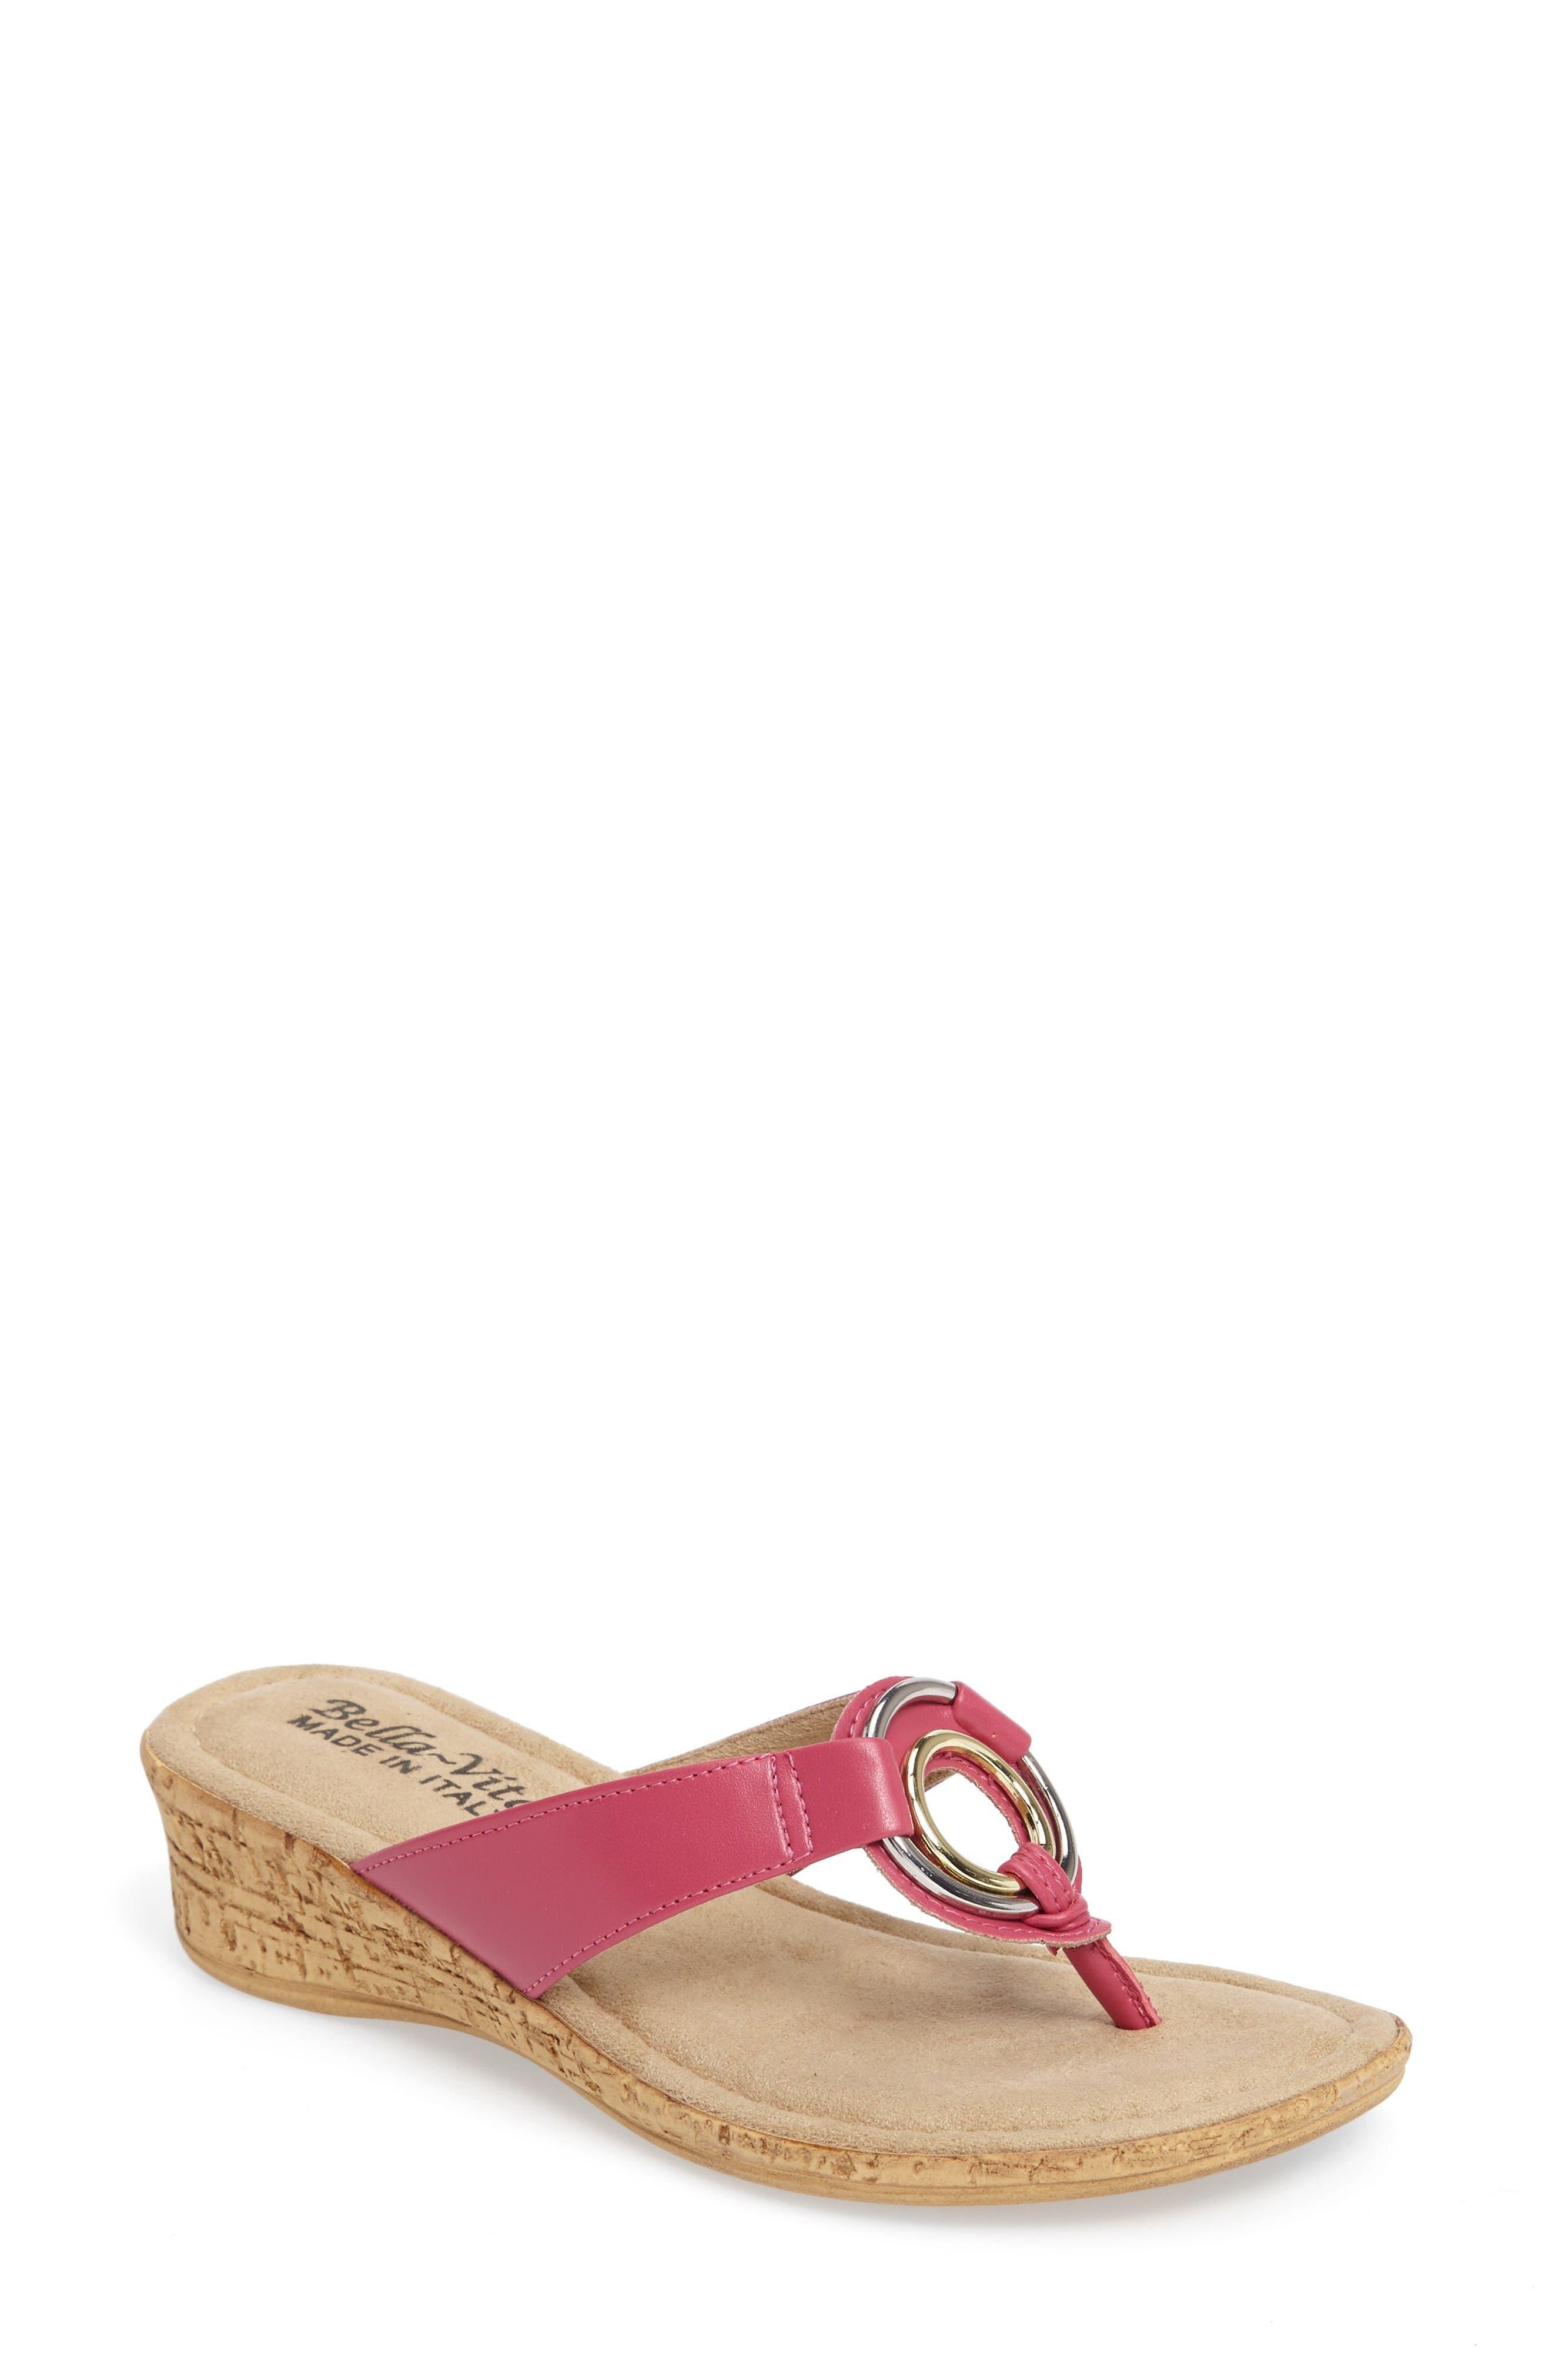 TUSCANY by Easy Street® Fina Wedge Sandal